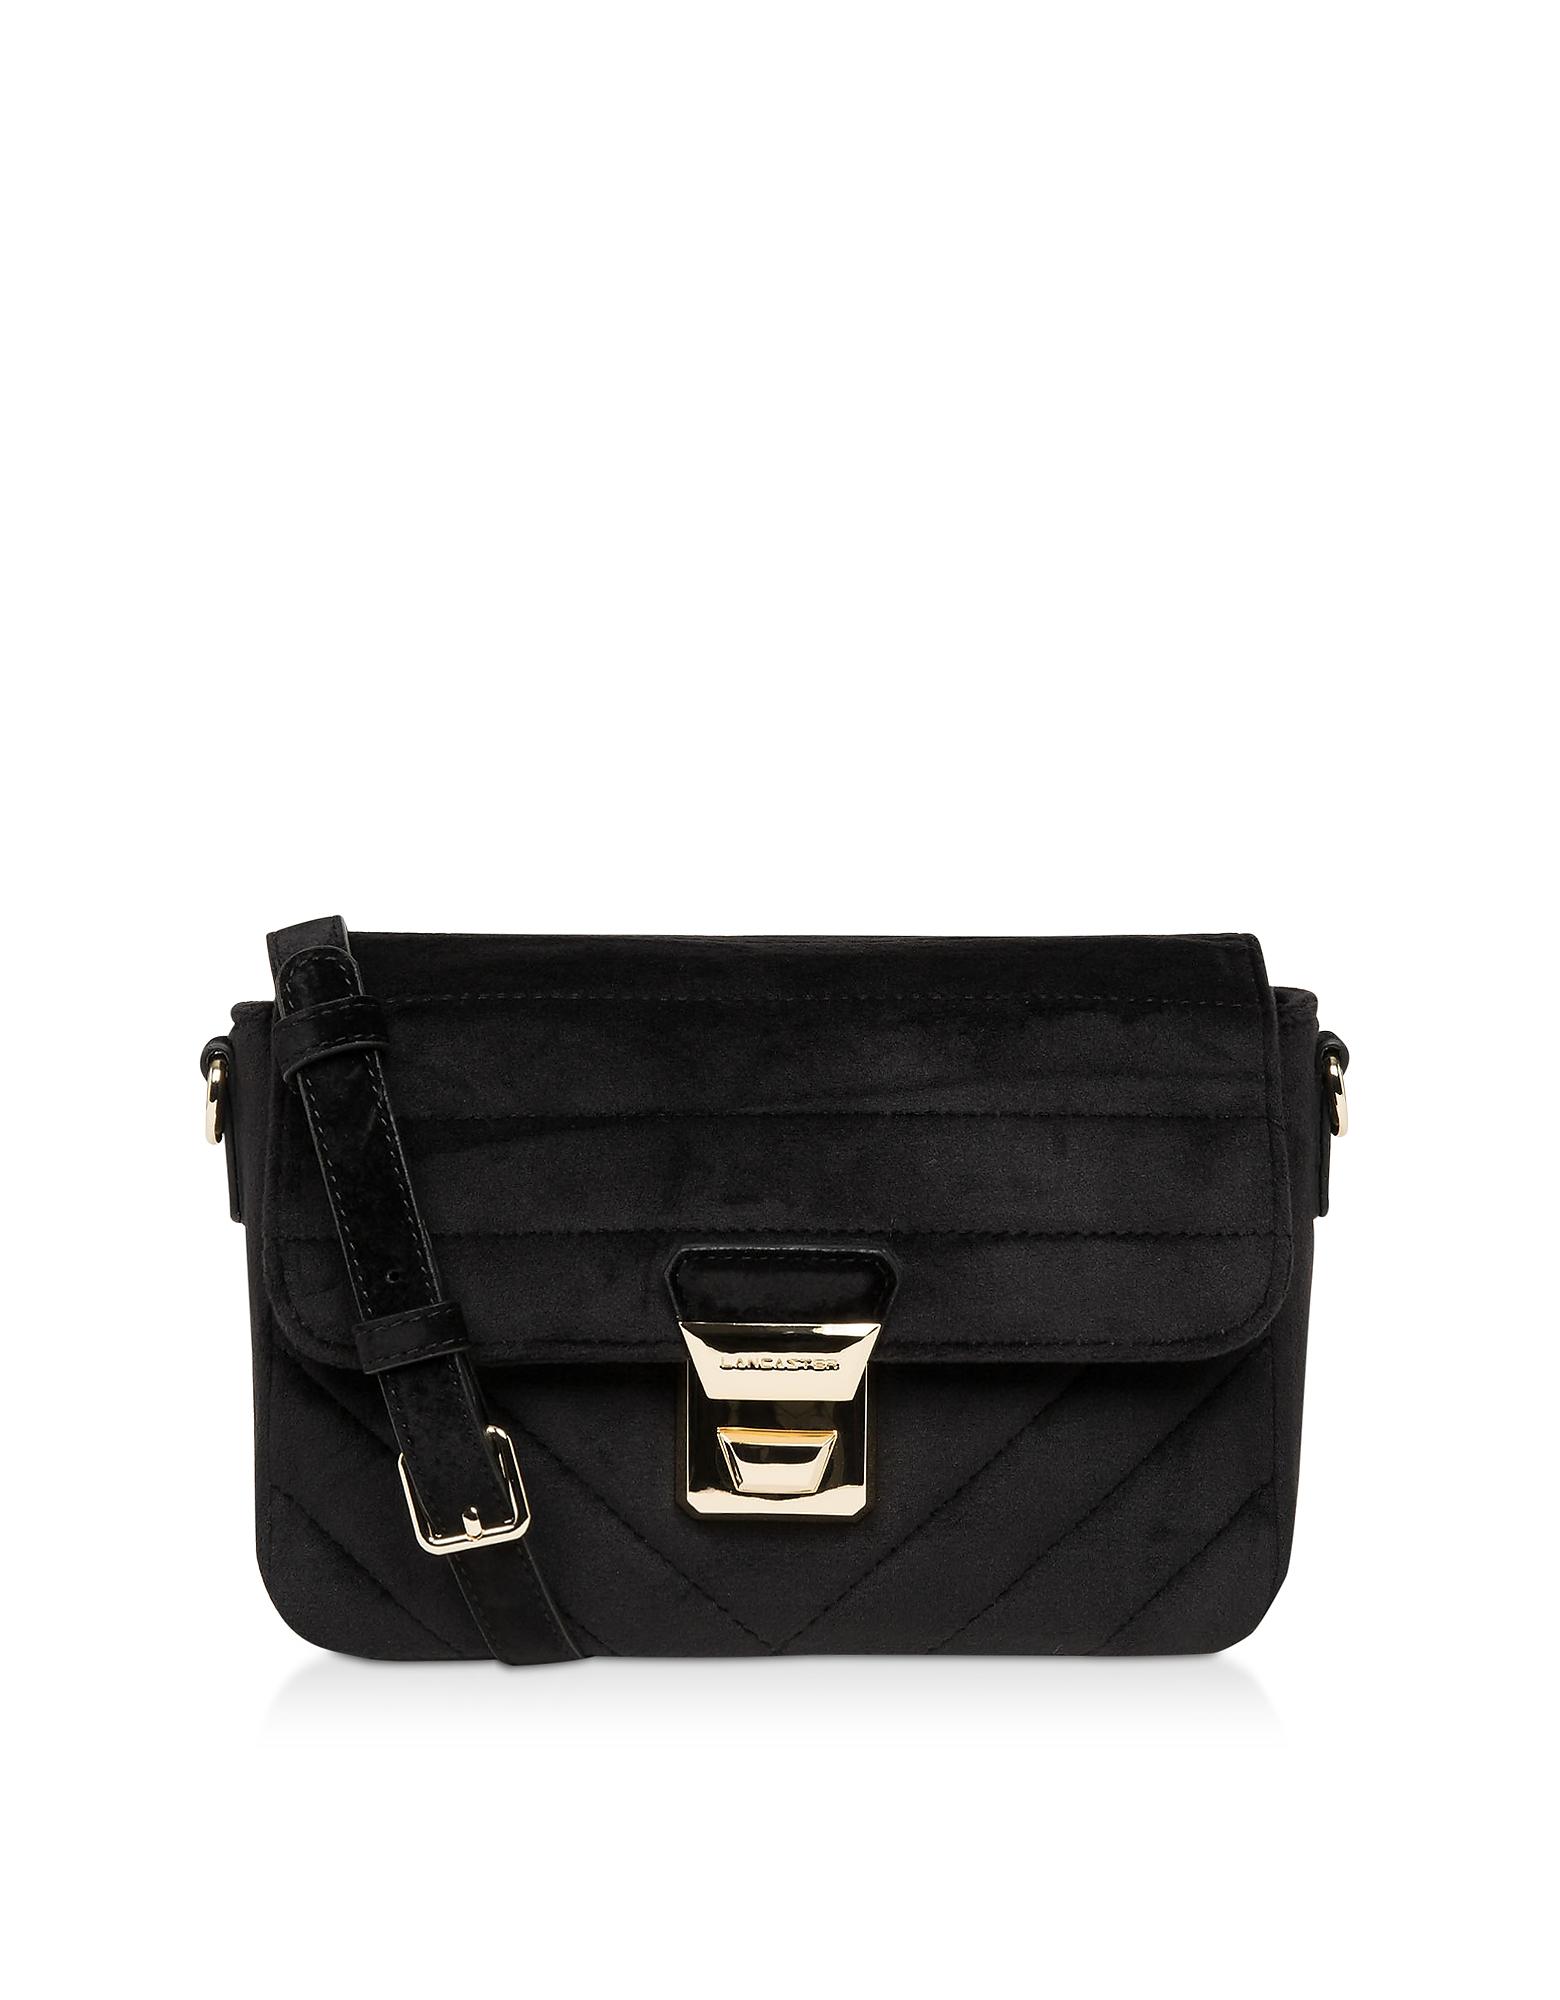 Lancaster Paris Designer Handbags, Actual Velvet Couture Flap Crossbody Bag